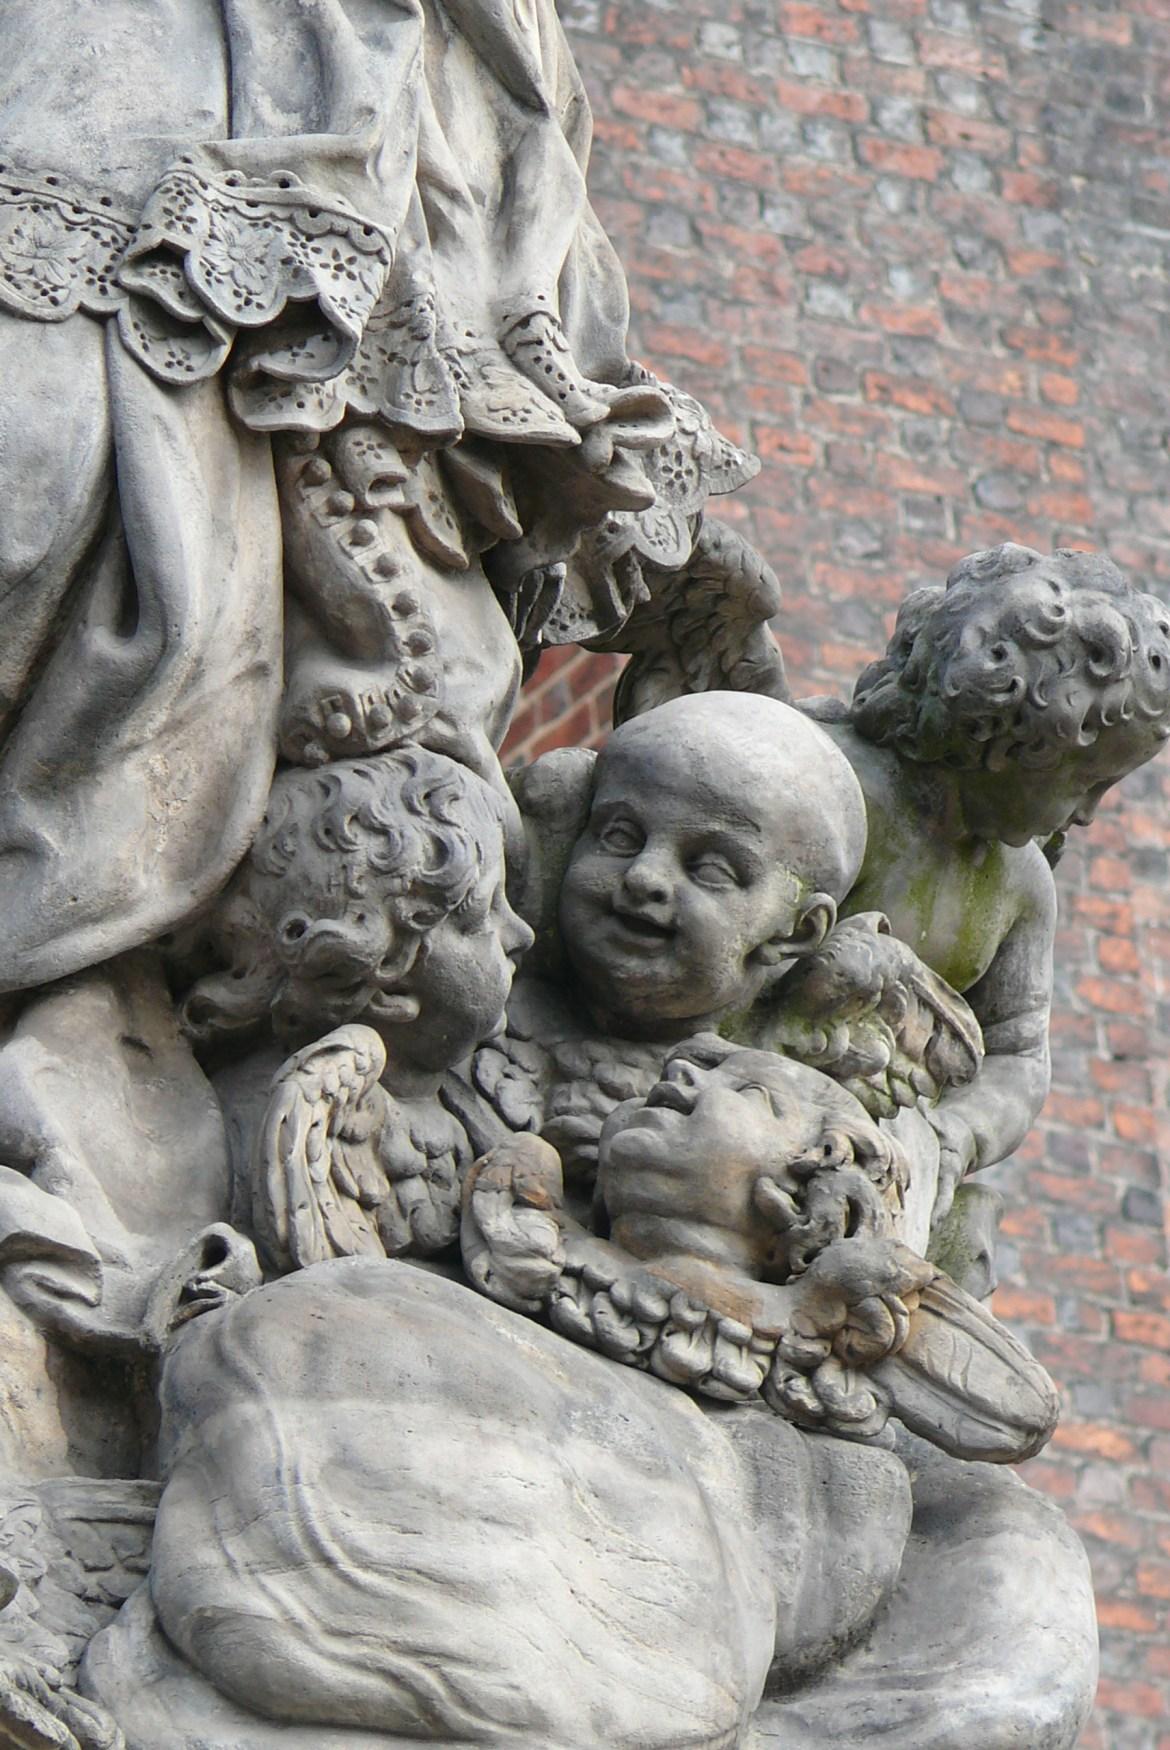 nepomucen plac katedralny aniołek łysy